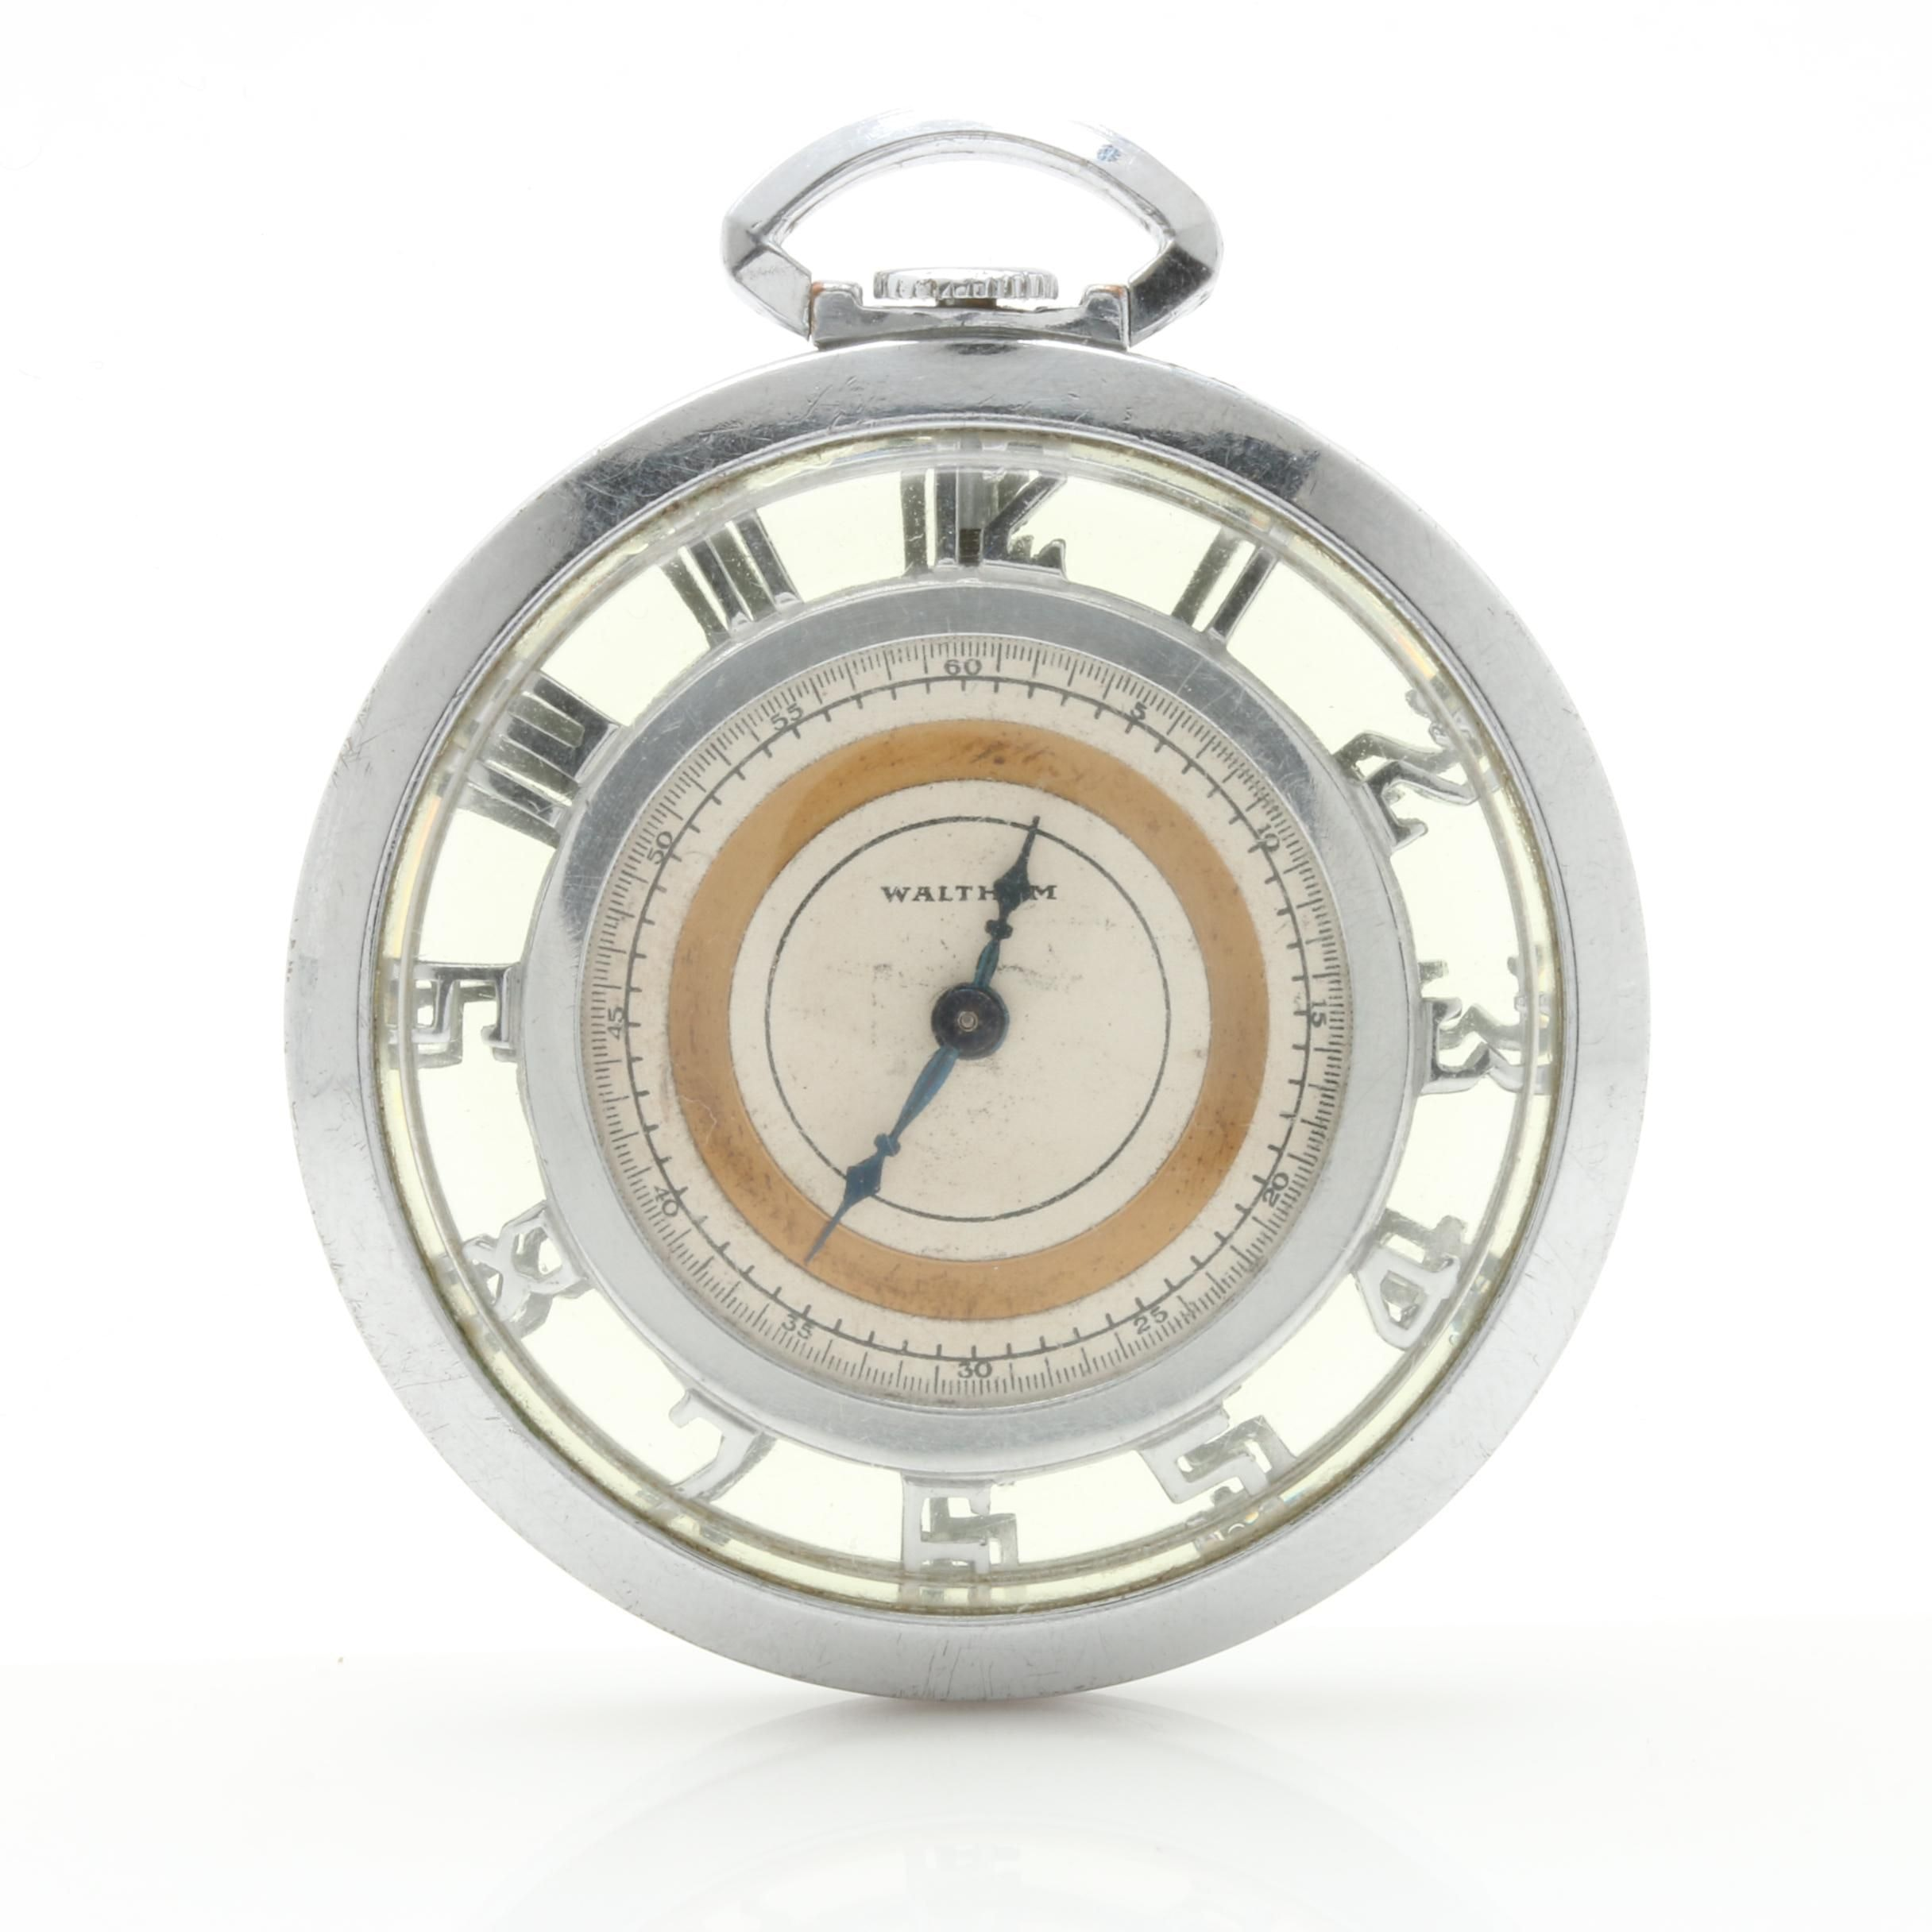 Waltham Silver-Tone Skeleton Pocket Watch